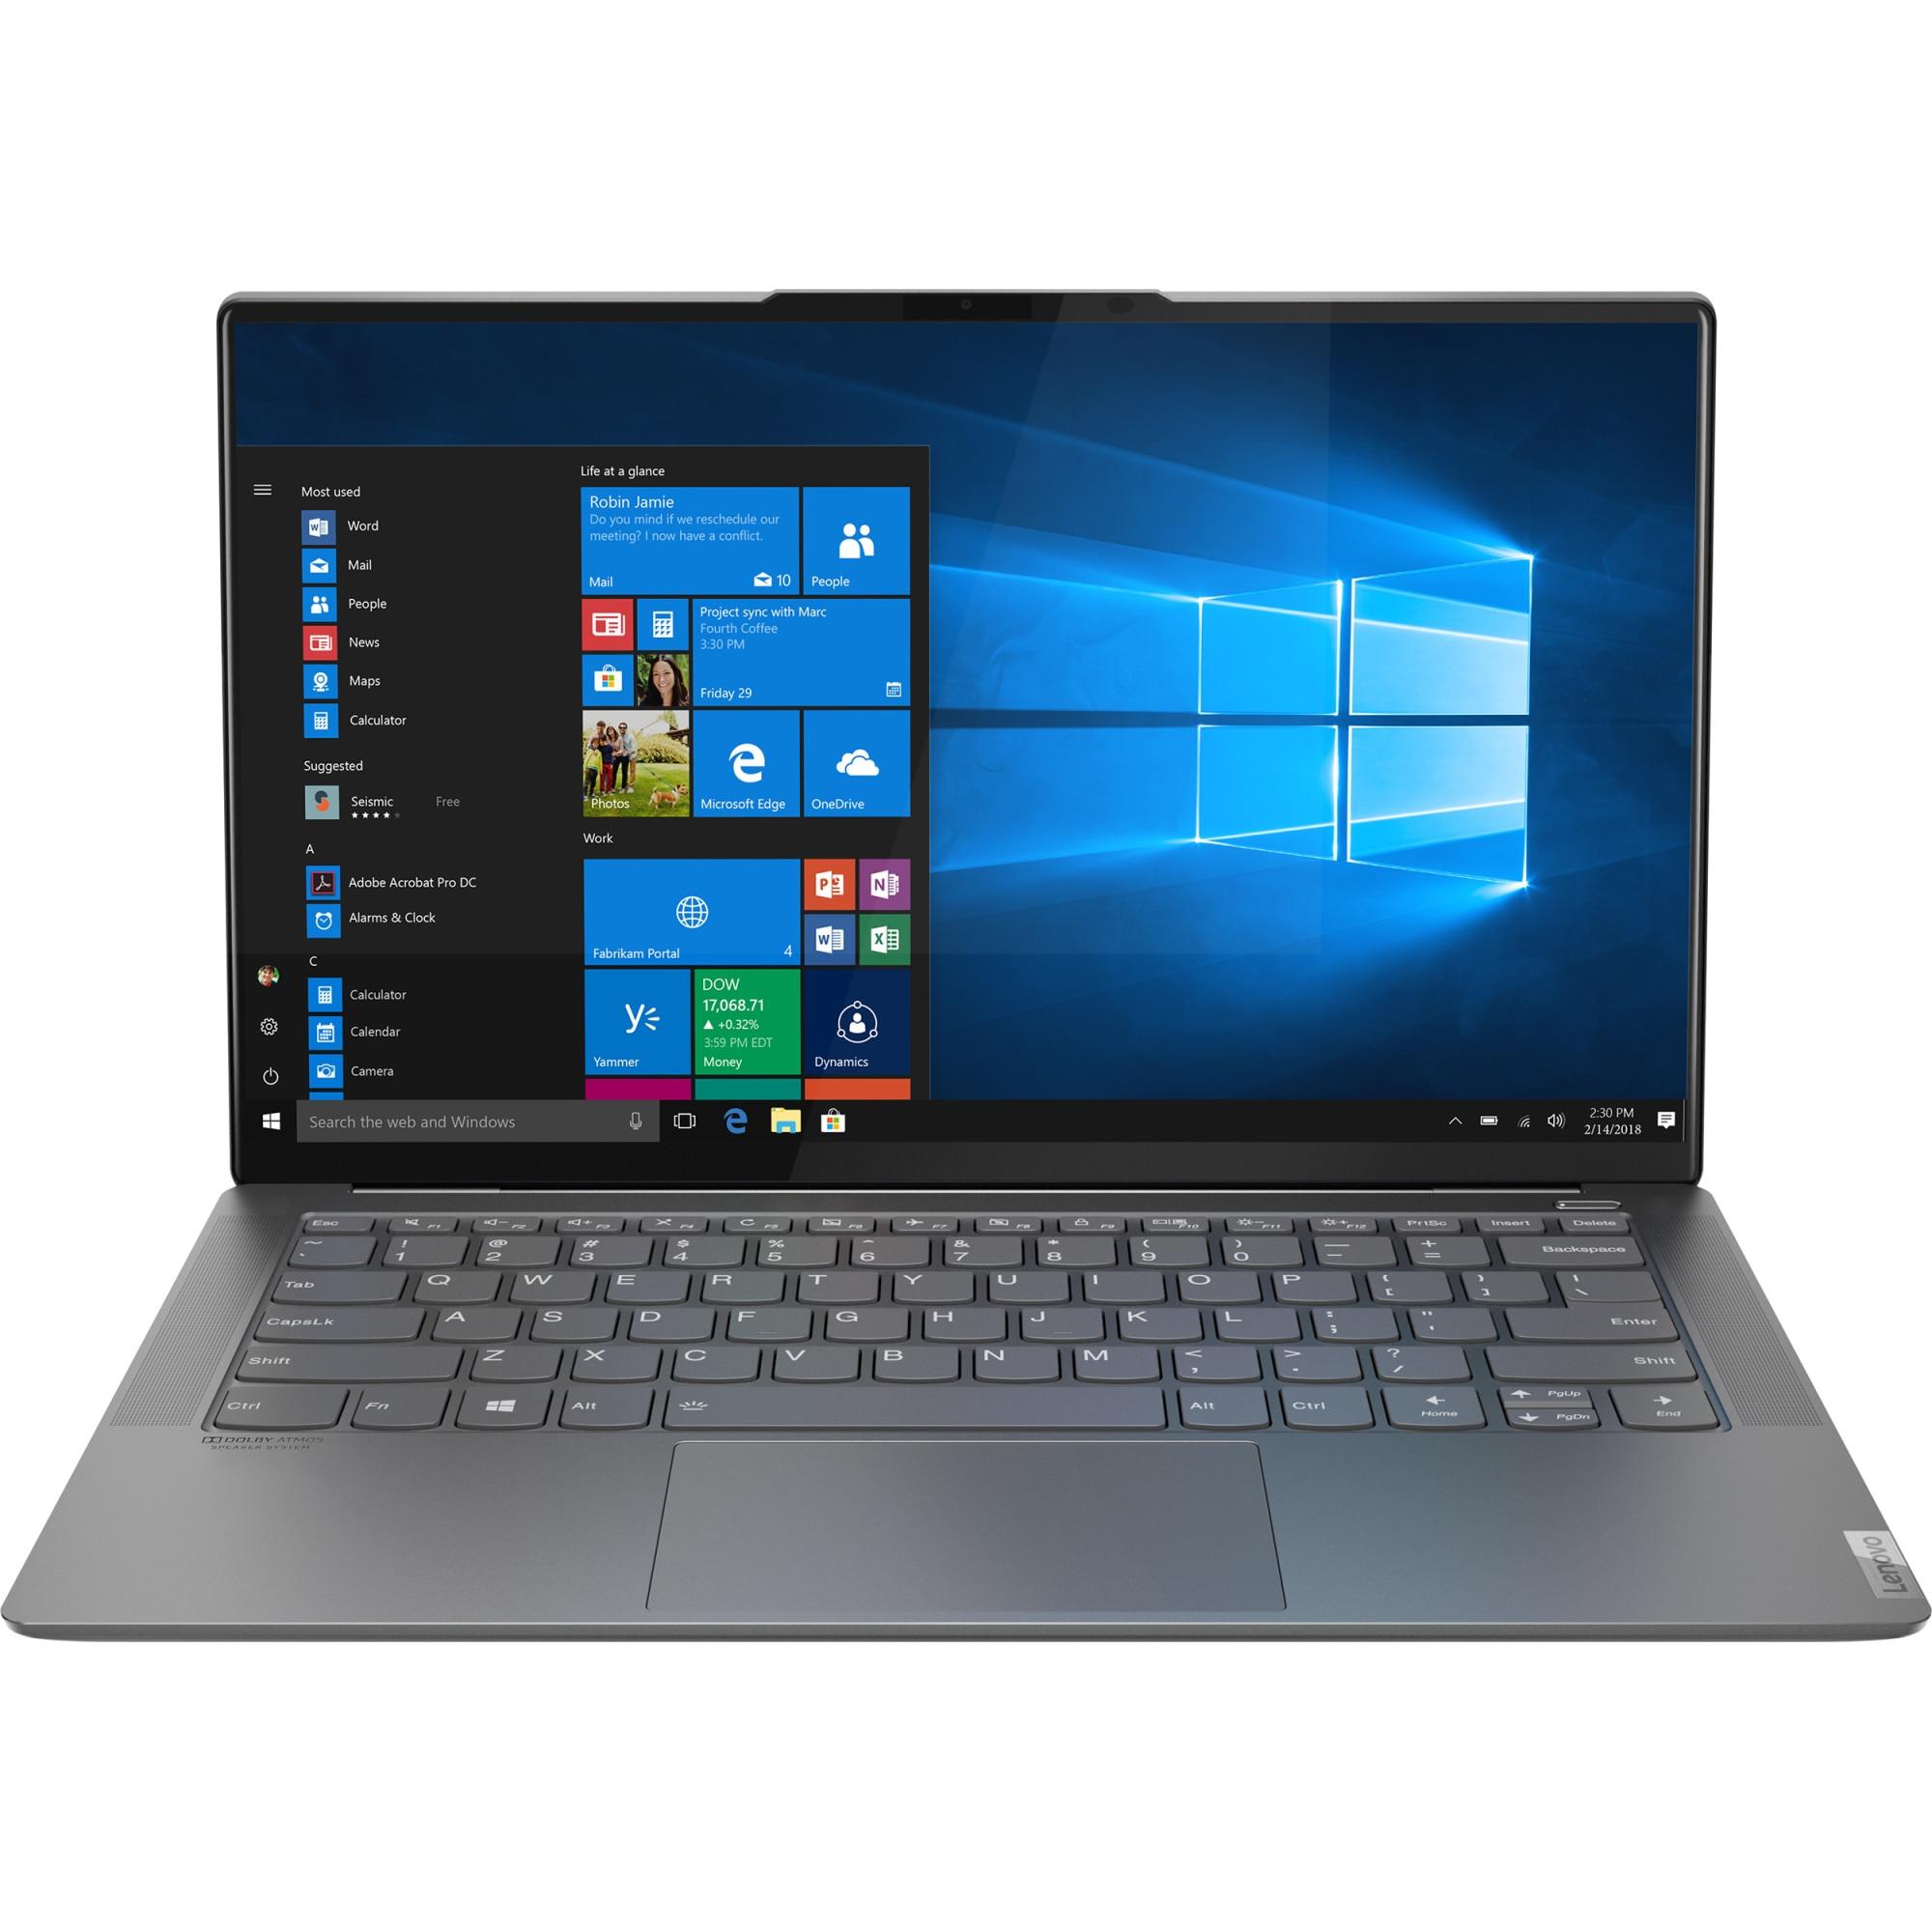 "Fotografie Laptop ultraportabil Lenovo YOGA S940-14IWL cu procesor Intel® Core™ i7-8565U pana la 4.60 GHz, Whiskey Lake, 14"", UHD, IPS, 16GB, 1TB SSD, Intel® UHD Graphics 620, Microsoft Windows 10, Iron Grey"